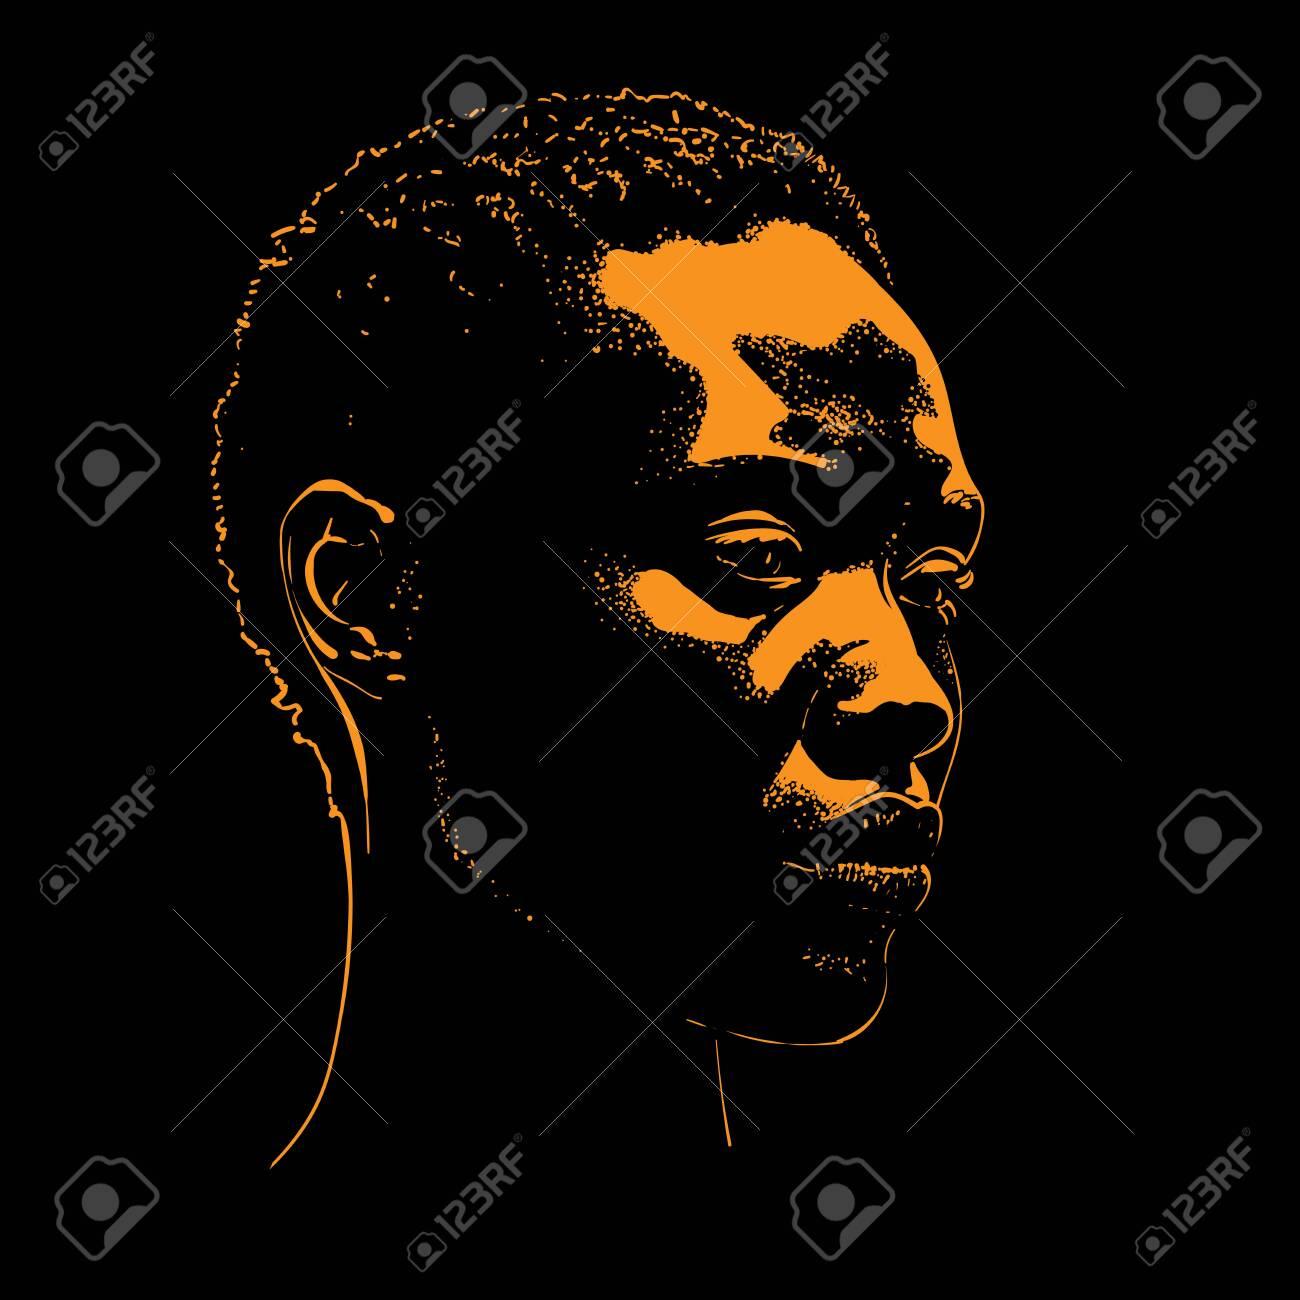 African woman portrait silhouette Vector. - 144792709